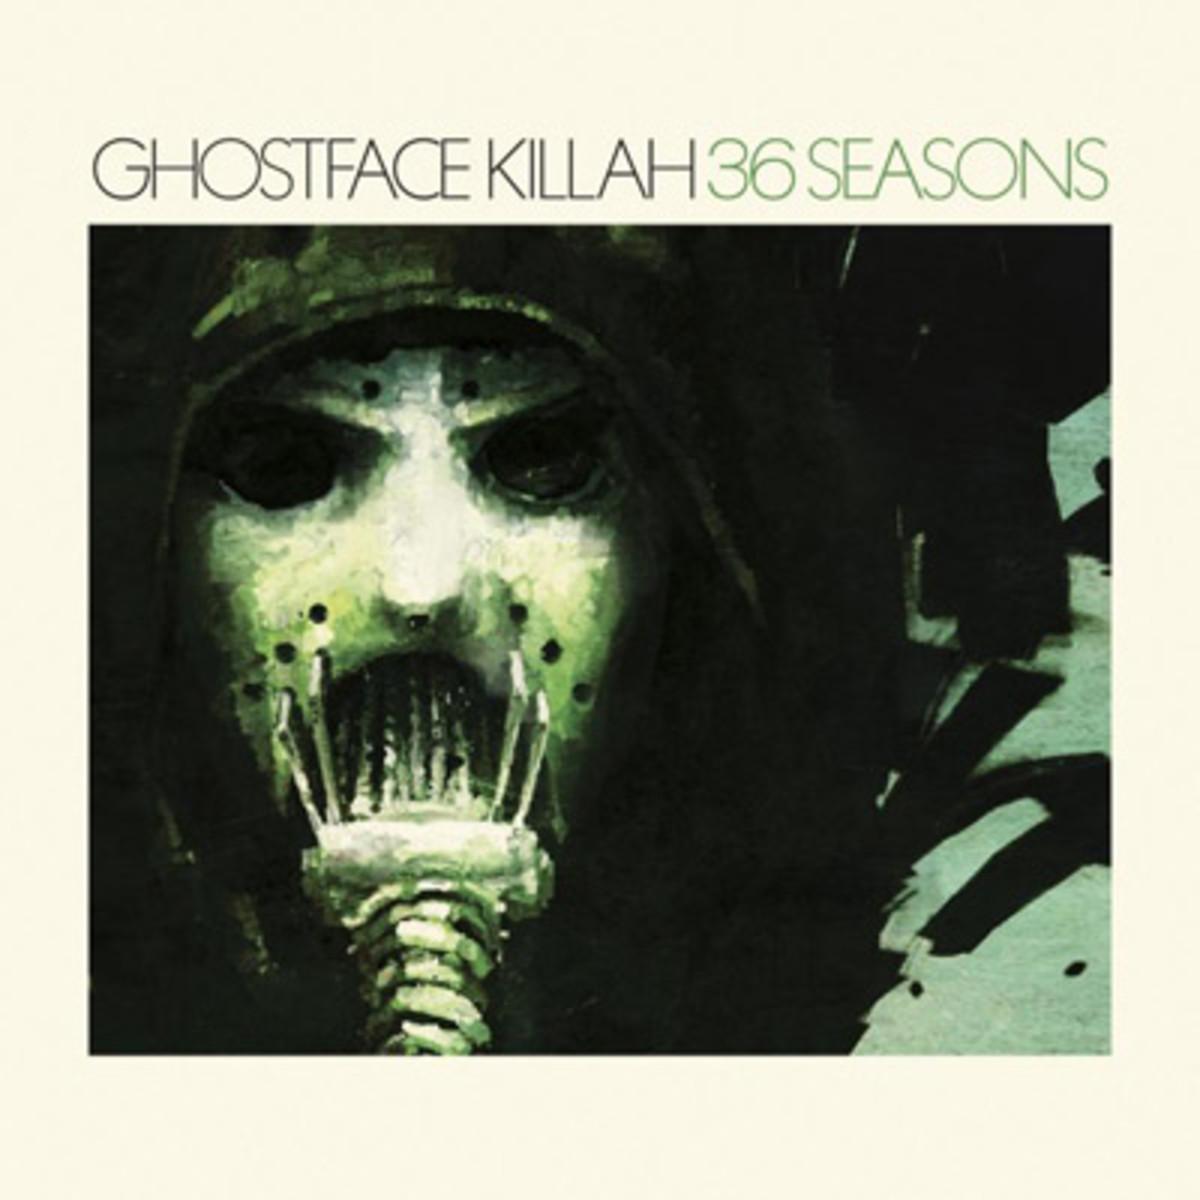 ghostface-36seasons.jpg